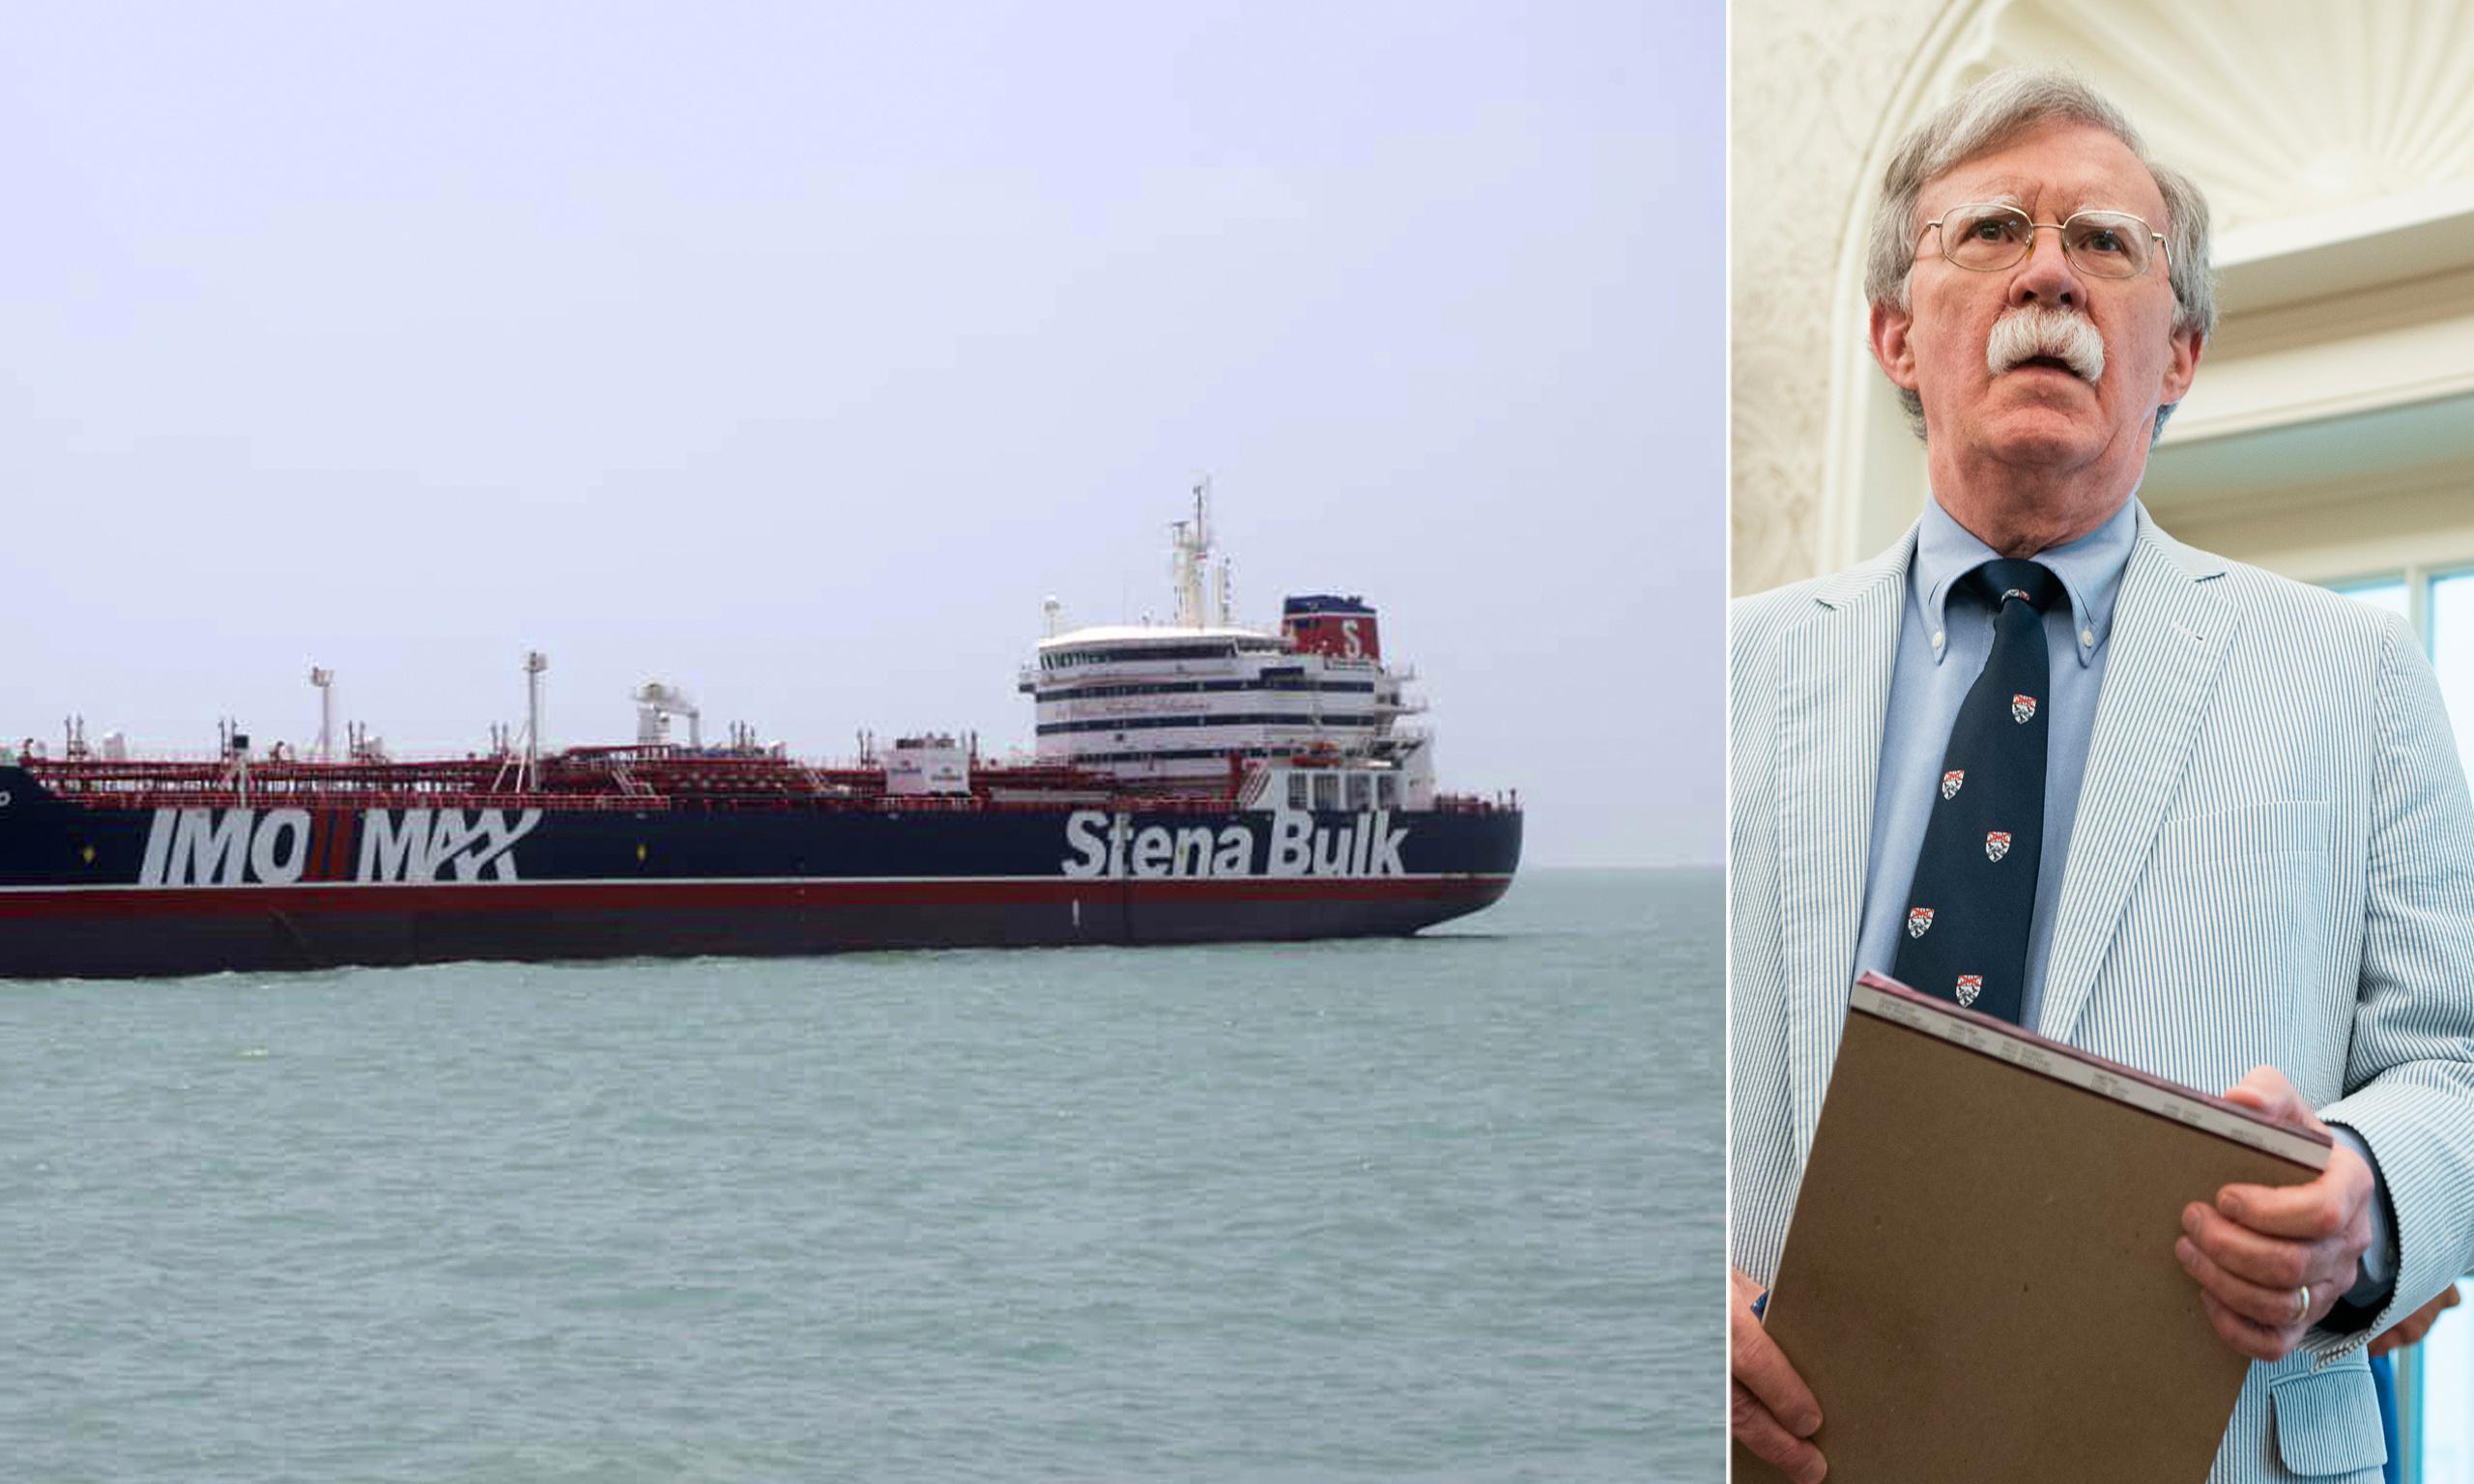 Trump's arch-hawk lured Britain into a dangerous trap to punish Iran